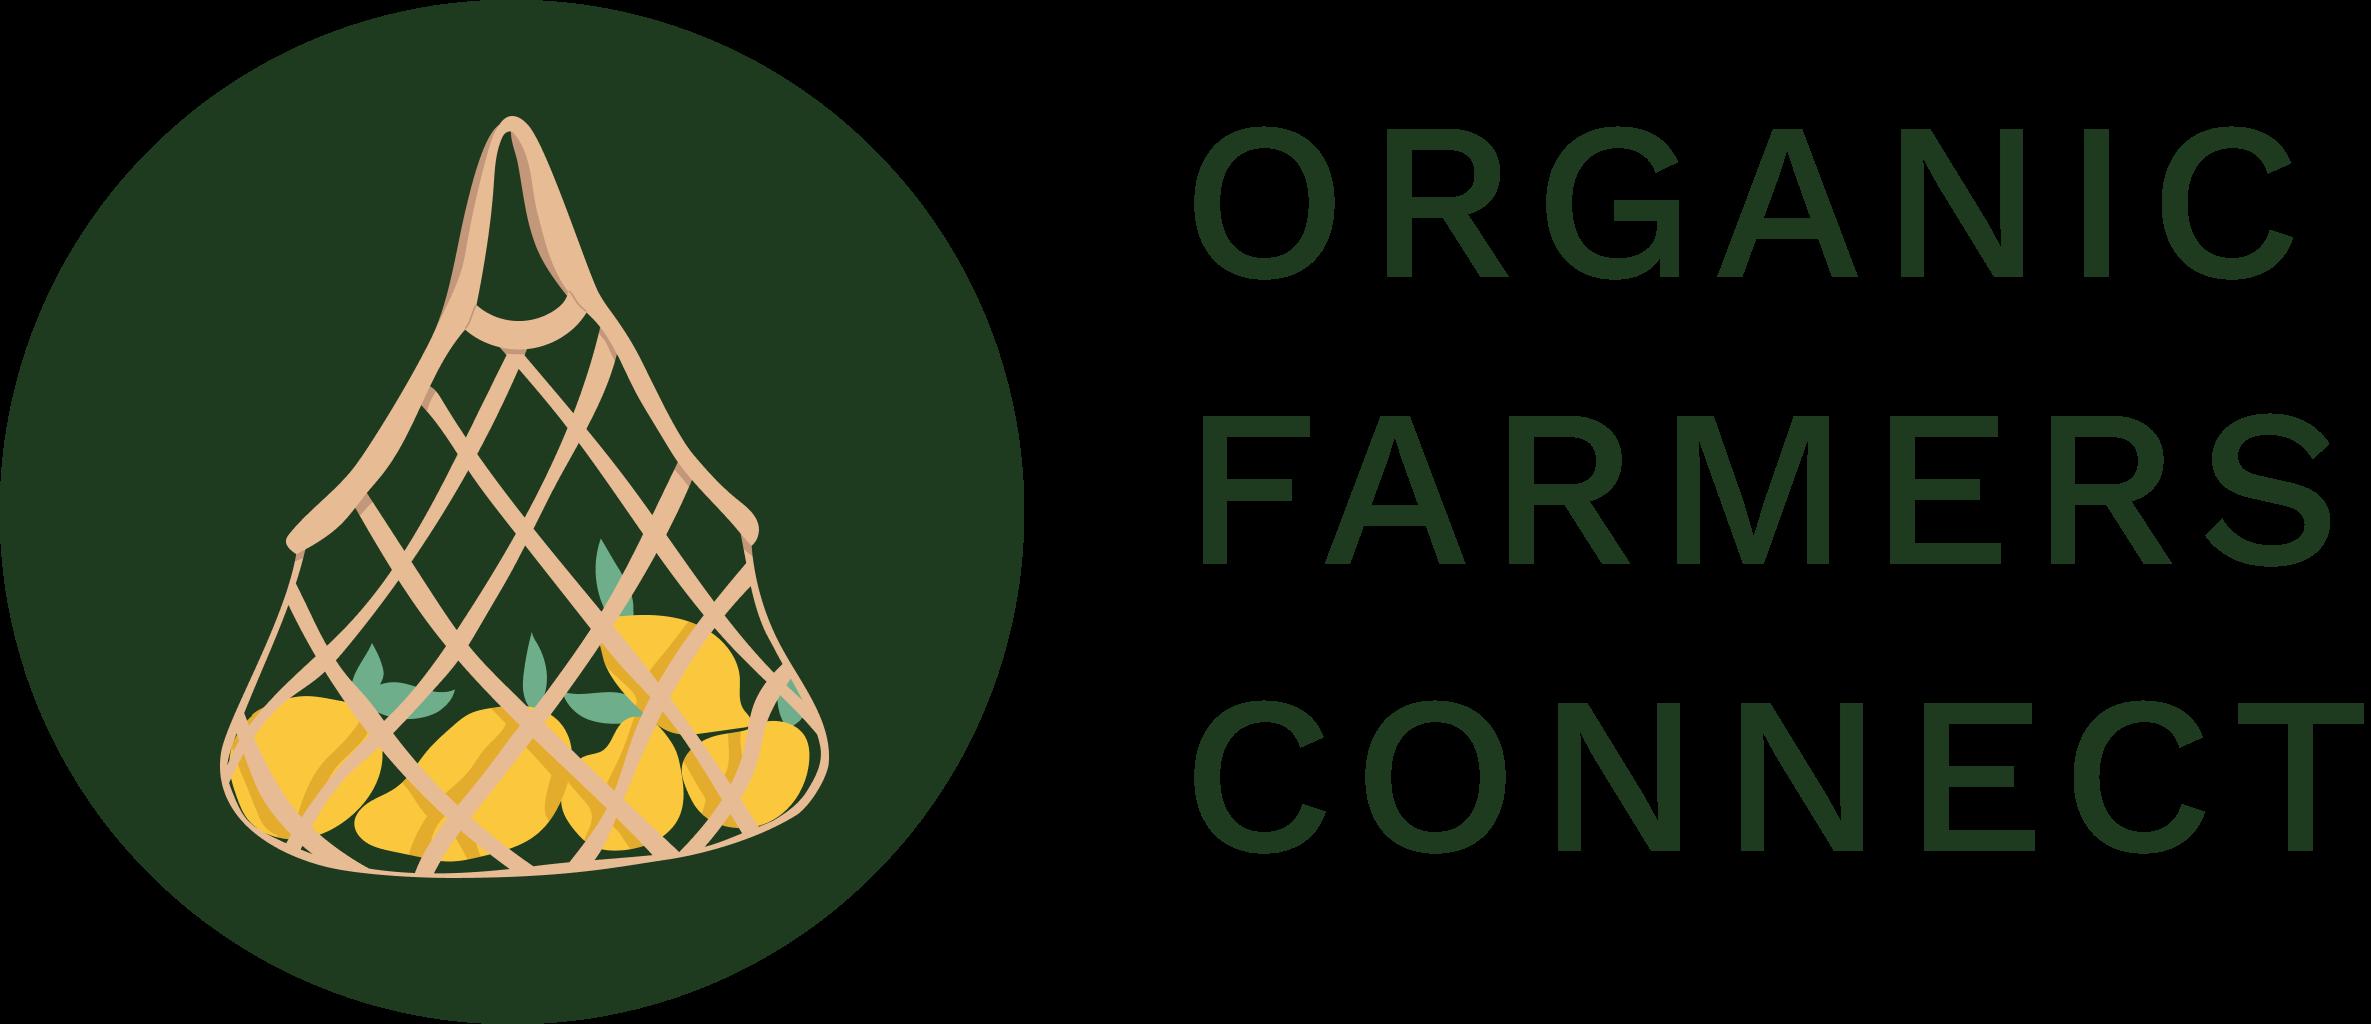 RavSam Web Solutions provided Mobile App Development, Web App Development to Organic Farmers Connect